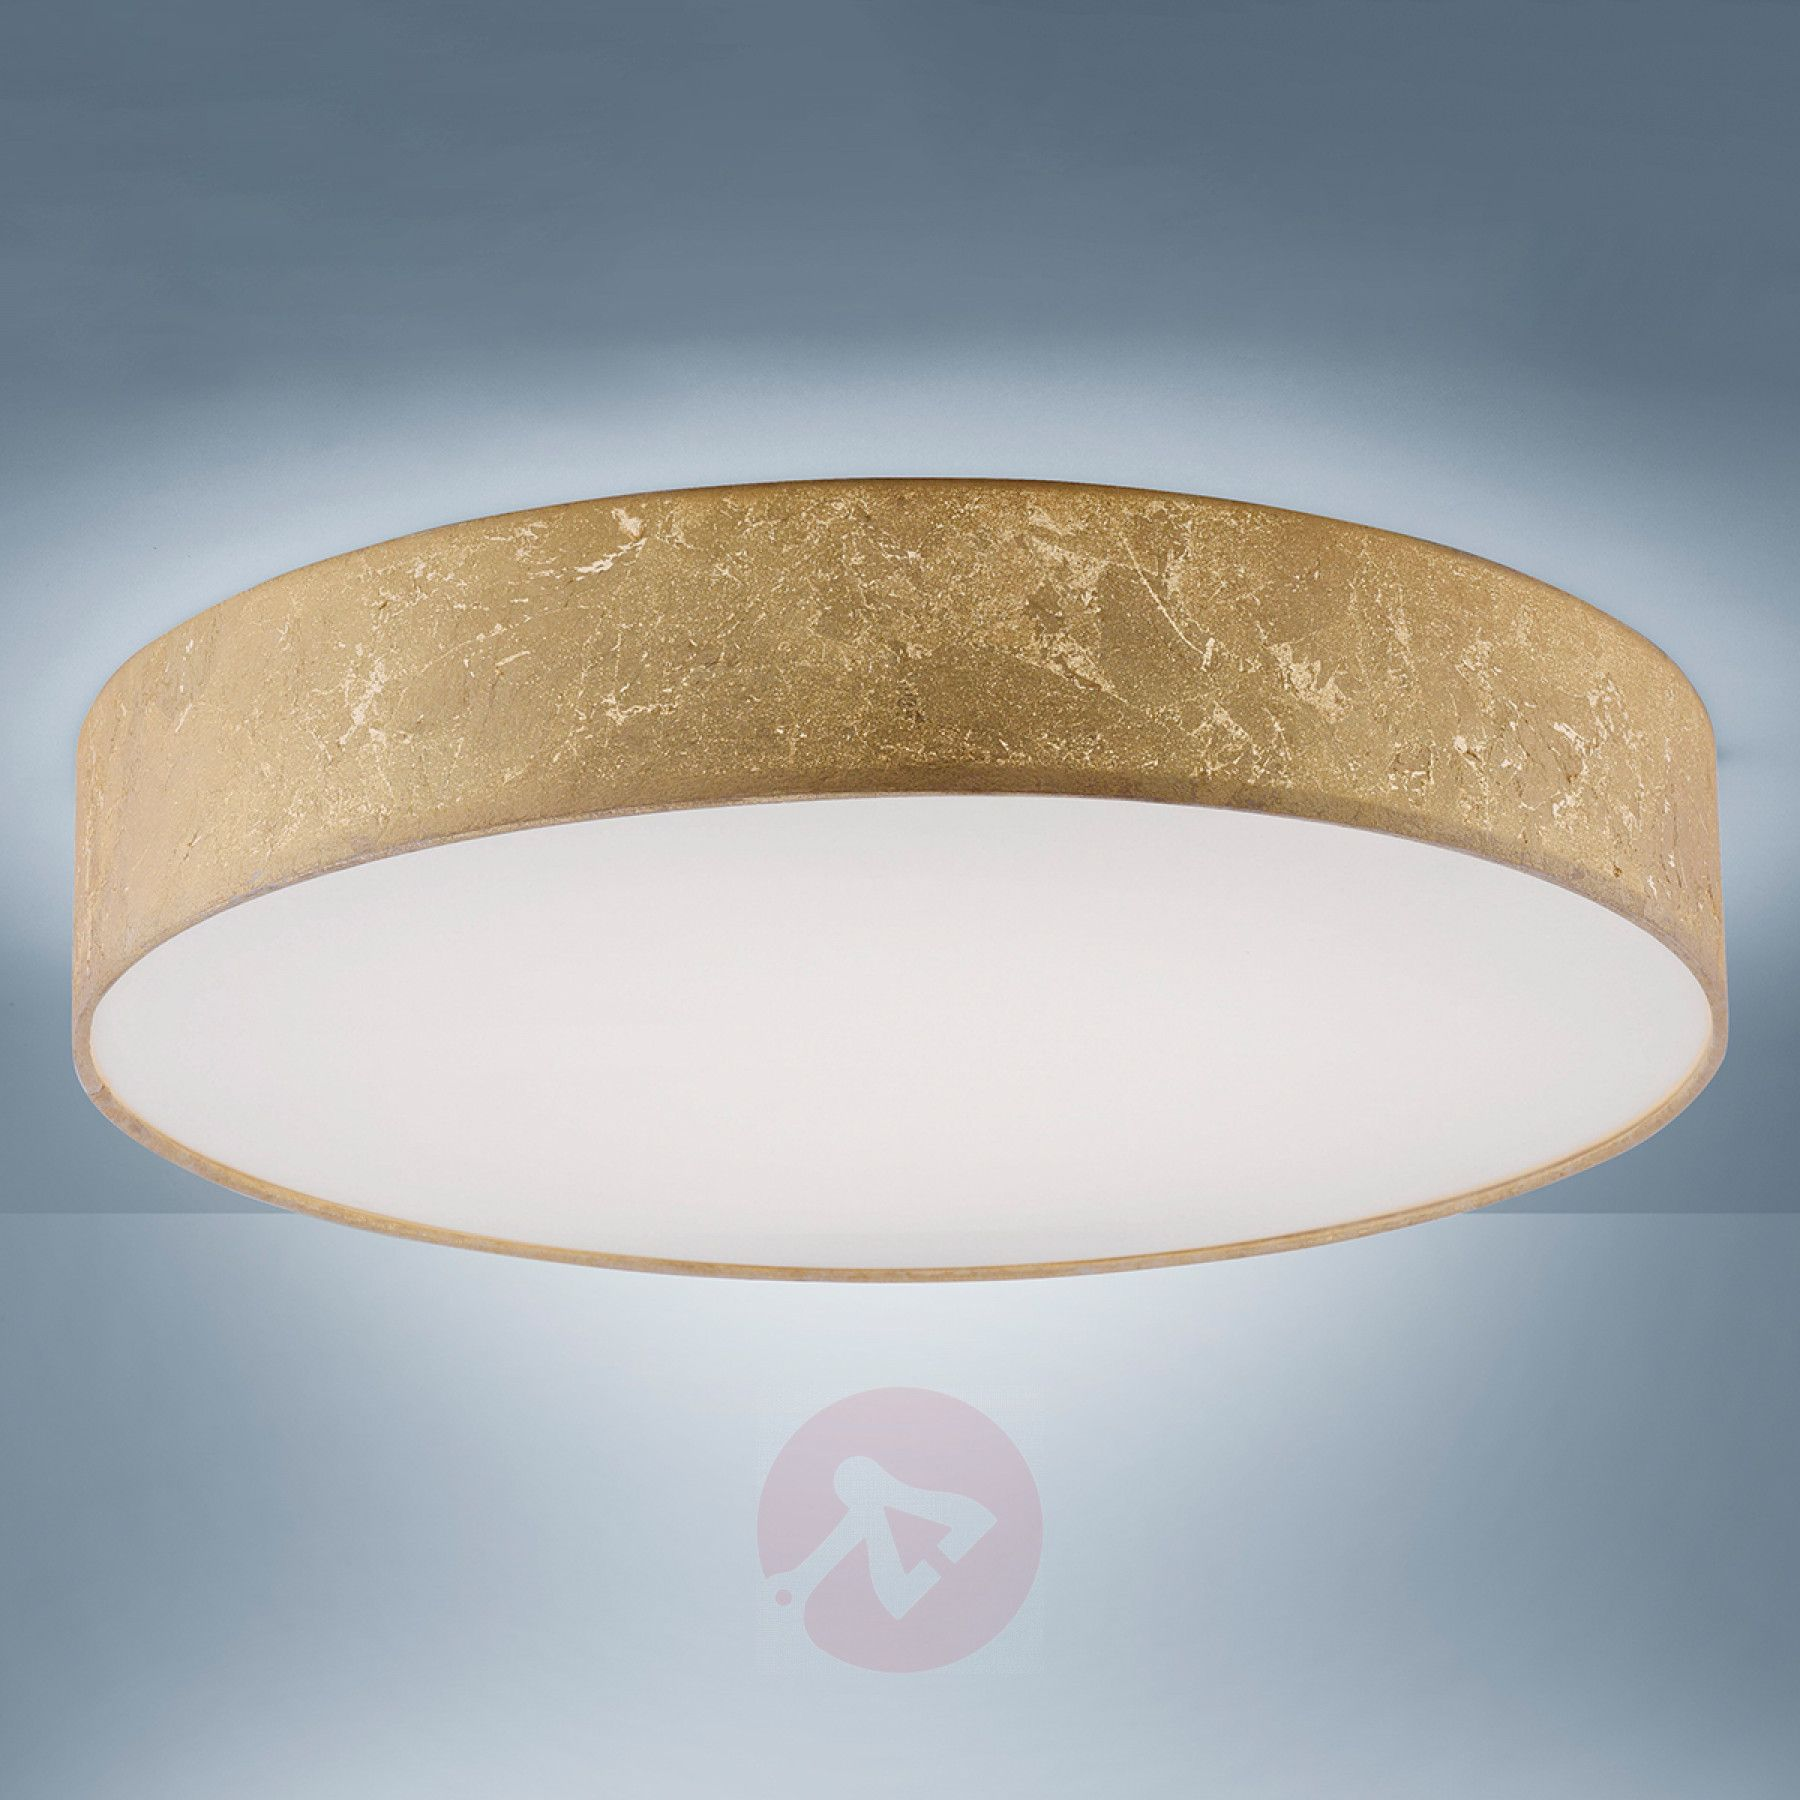 Verrassend Paul Neuhaus Q-KIARA Textil-Deckenlampe in GoldArt.-Nr RP-71